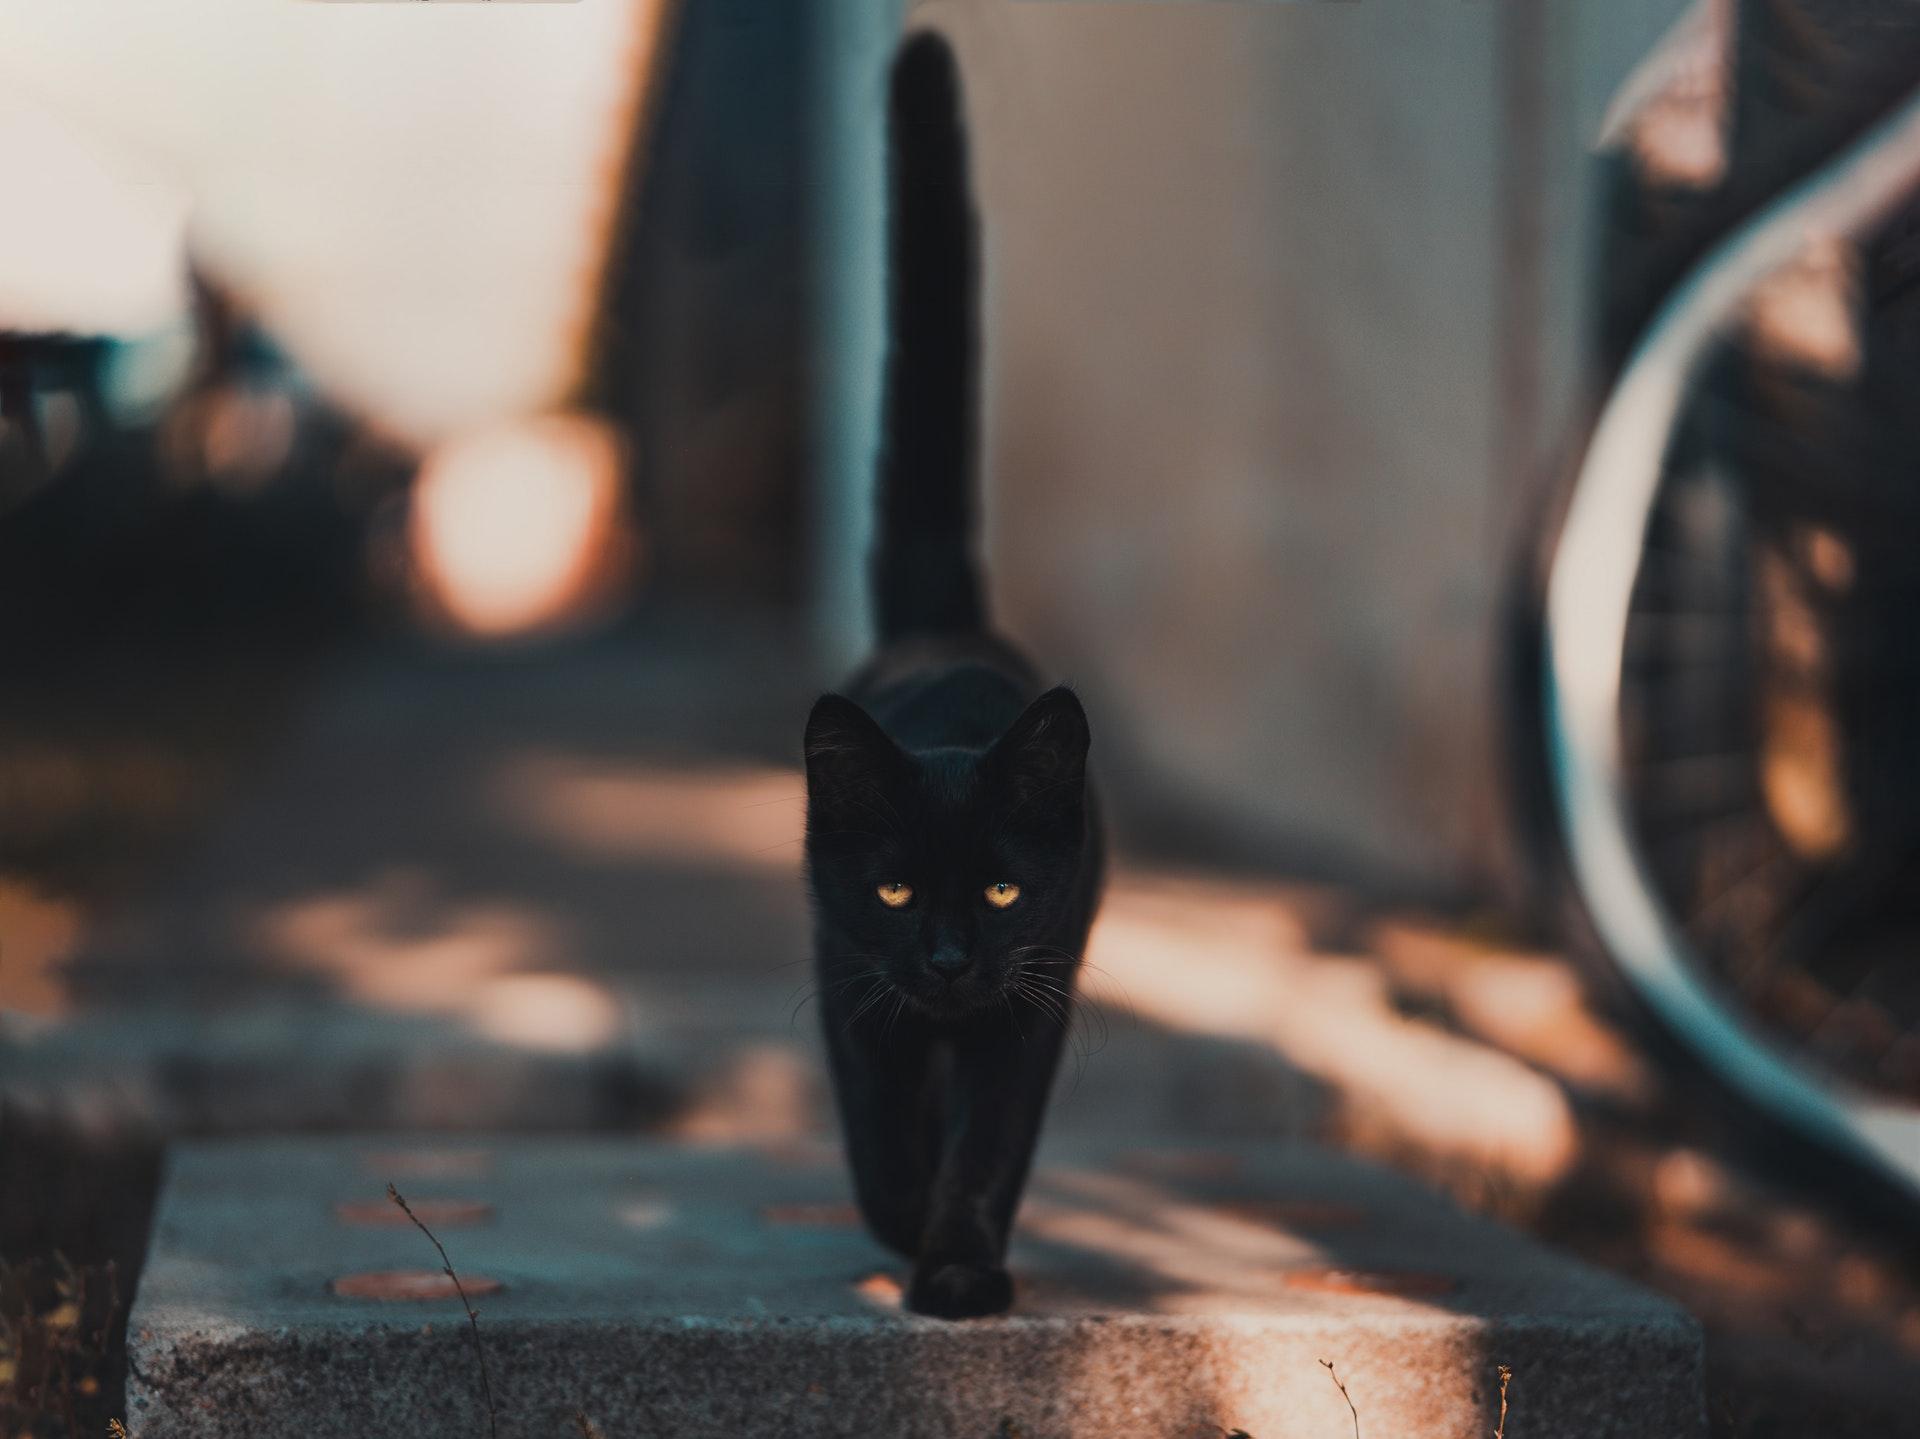 black cat walking tail straight up